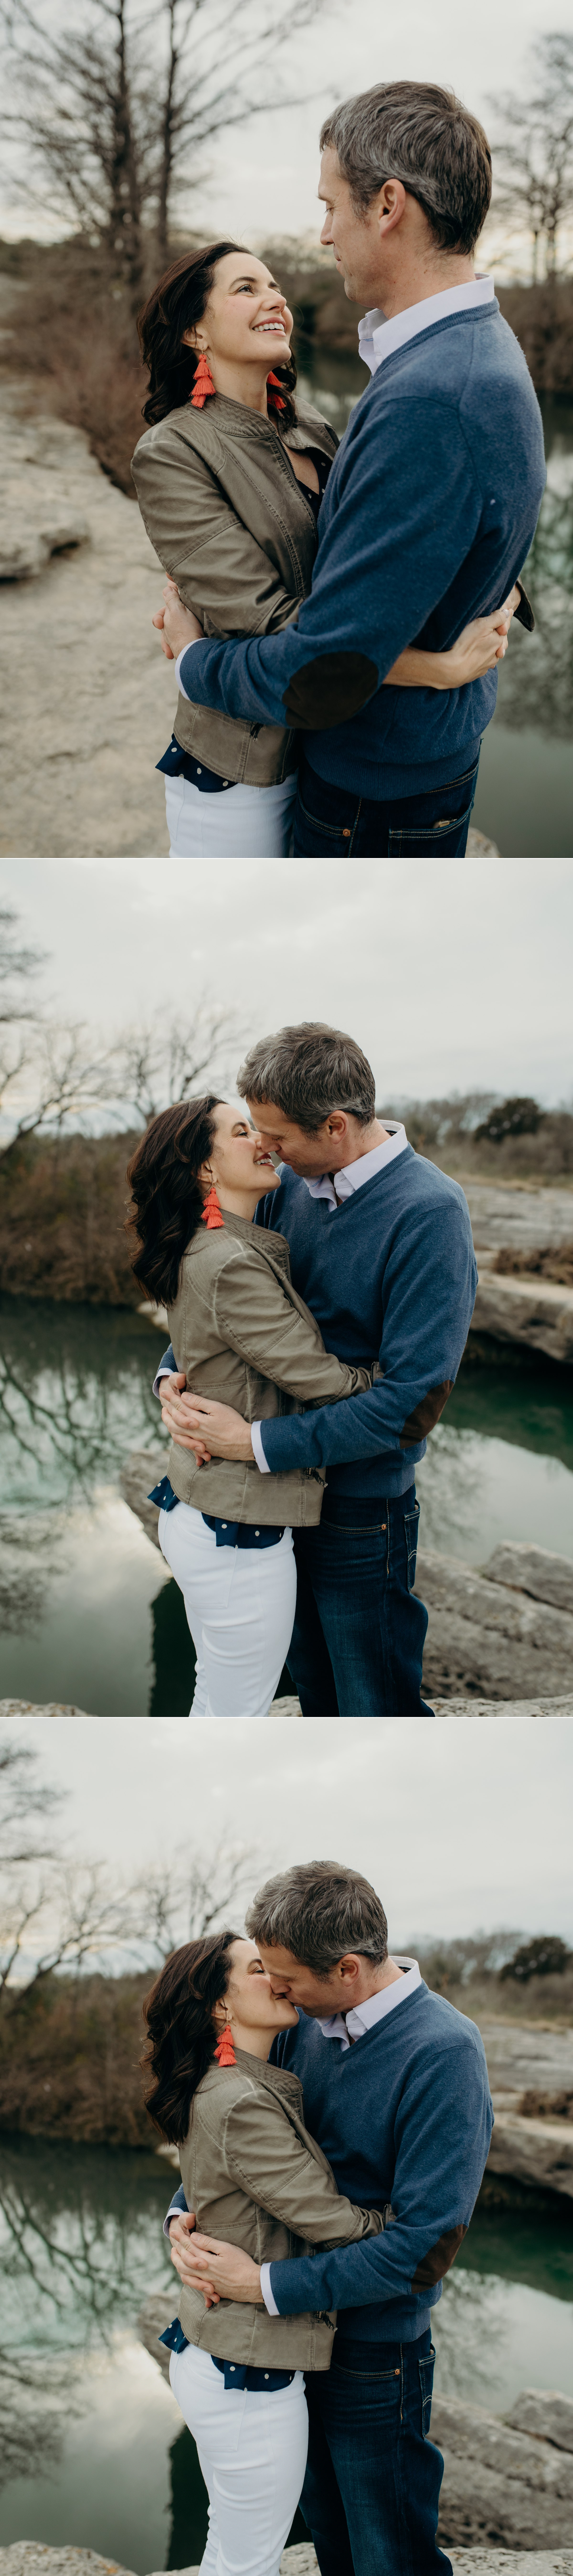 austin-mckinney-falls-engagement-photographer-elopement-prices-best-headshot-senior-adventurous-italy-minneapolis-texas-minnesota-dallas-houston-tulum-mexico_0030.jpg